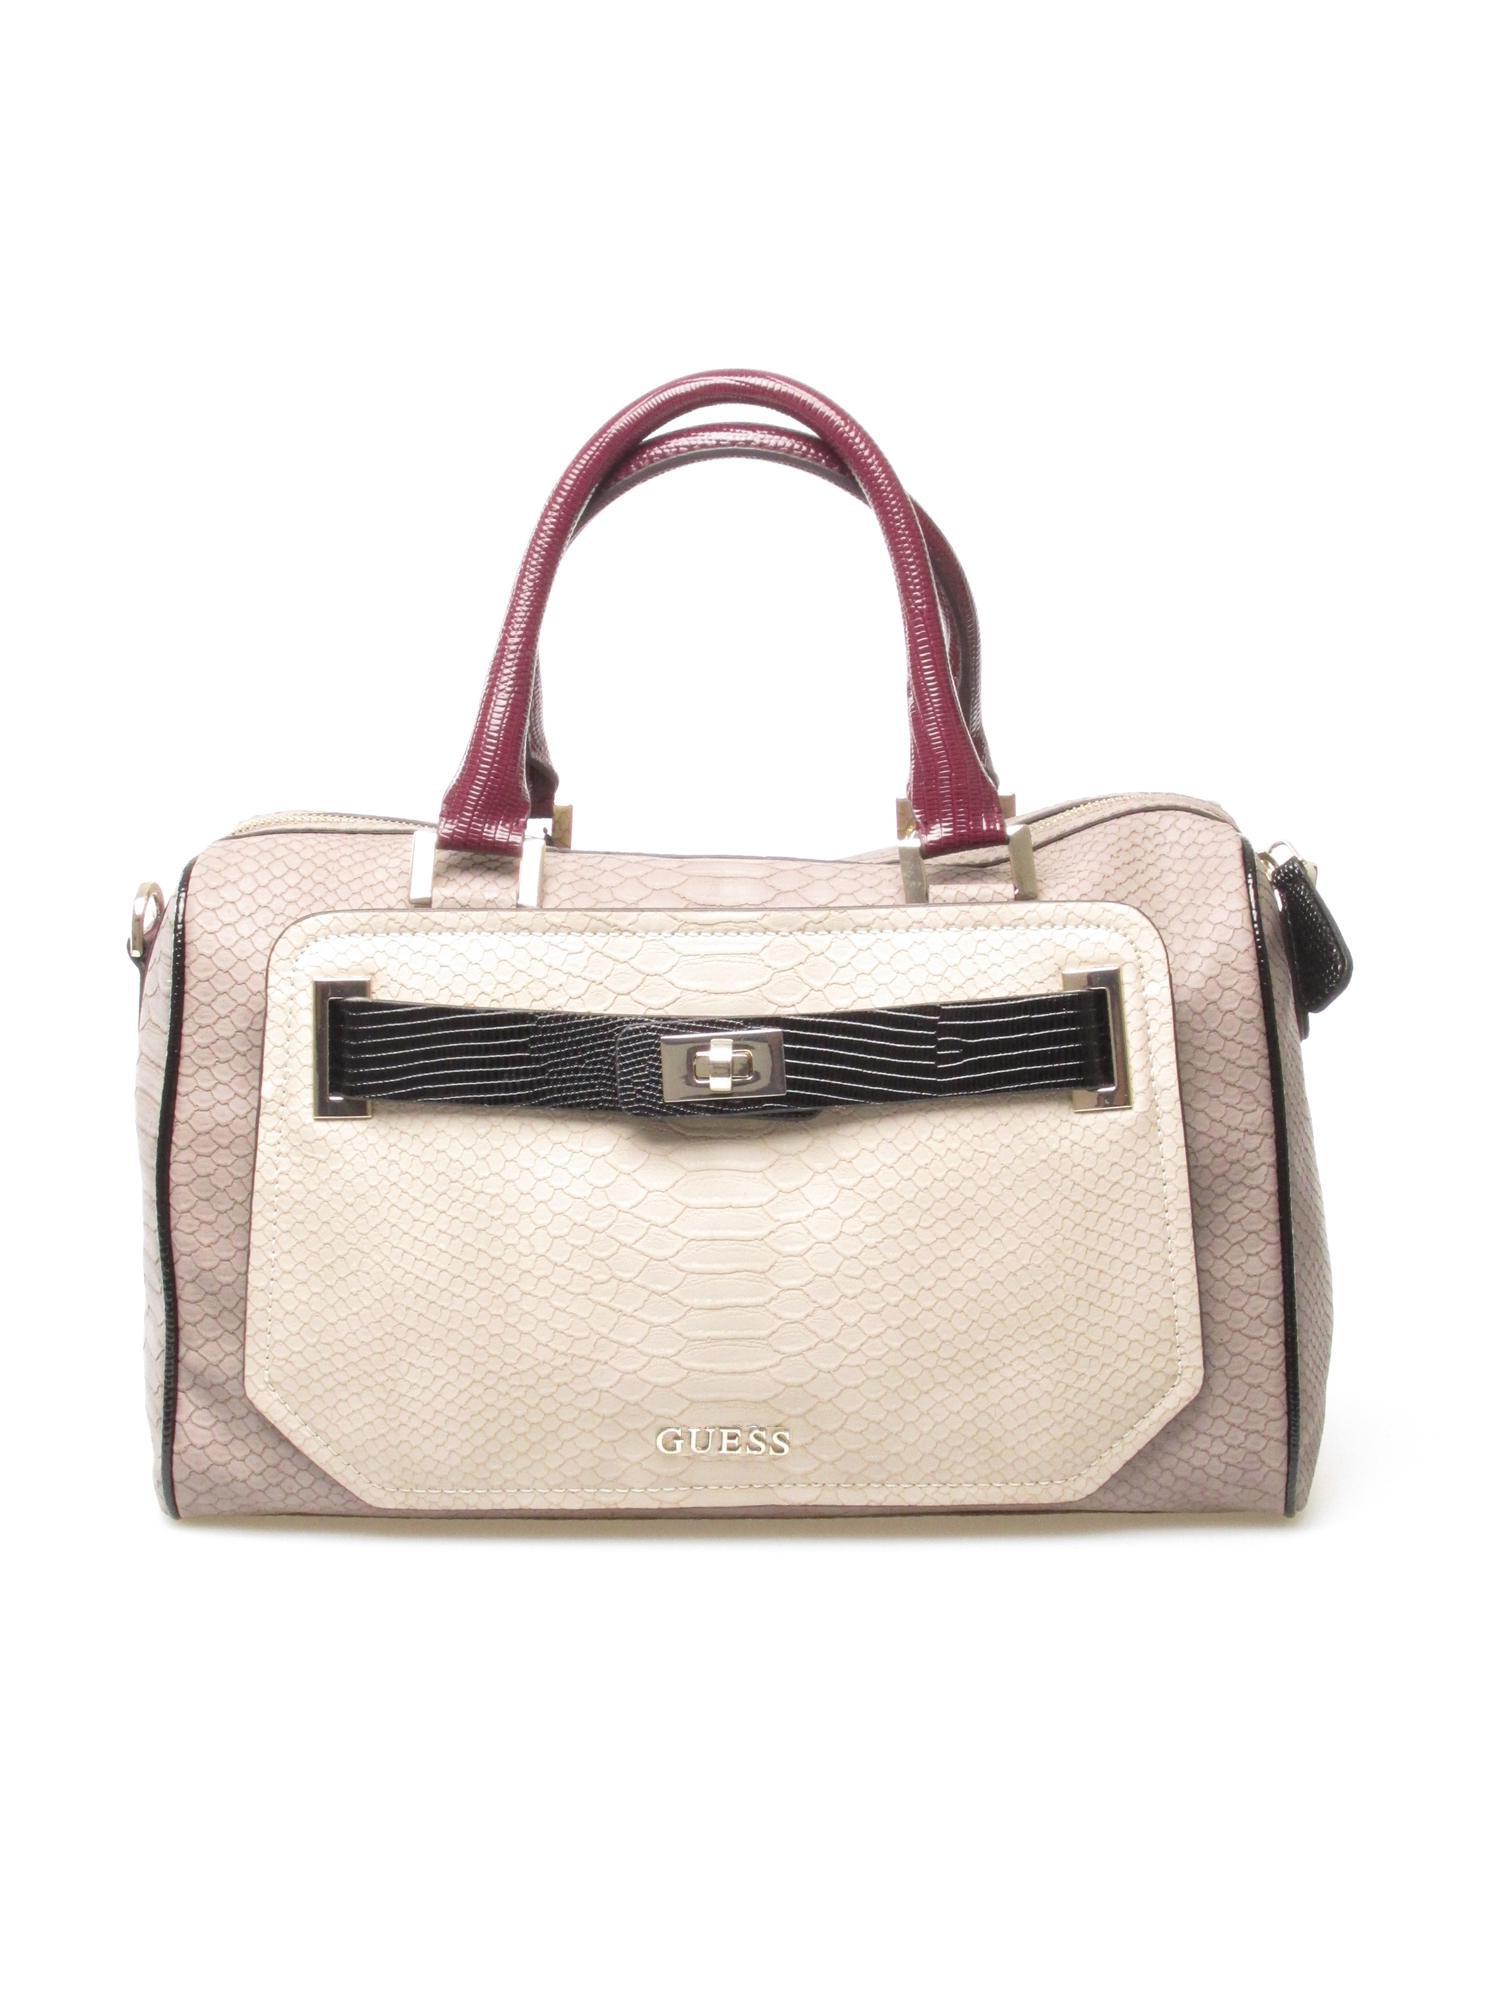 guess satchel womens satchel satchel bag